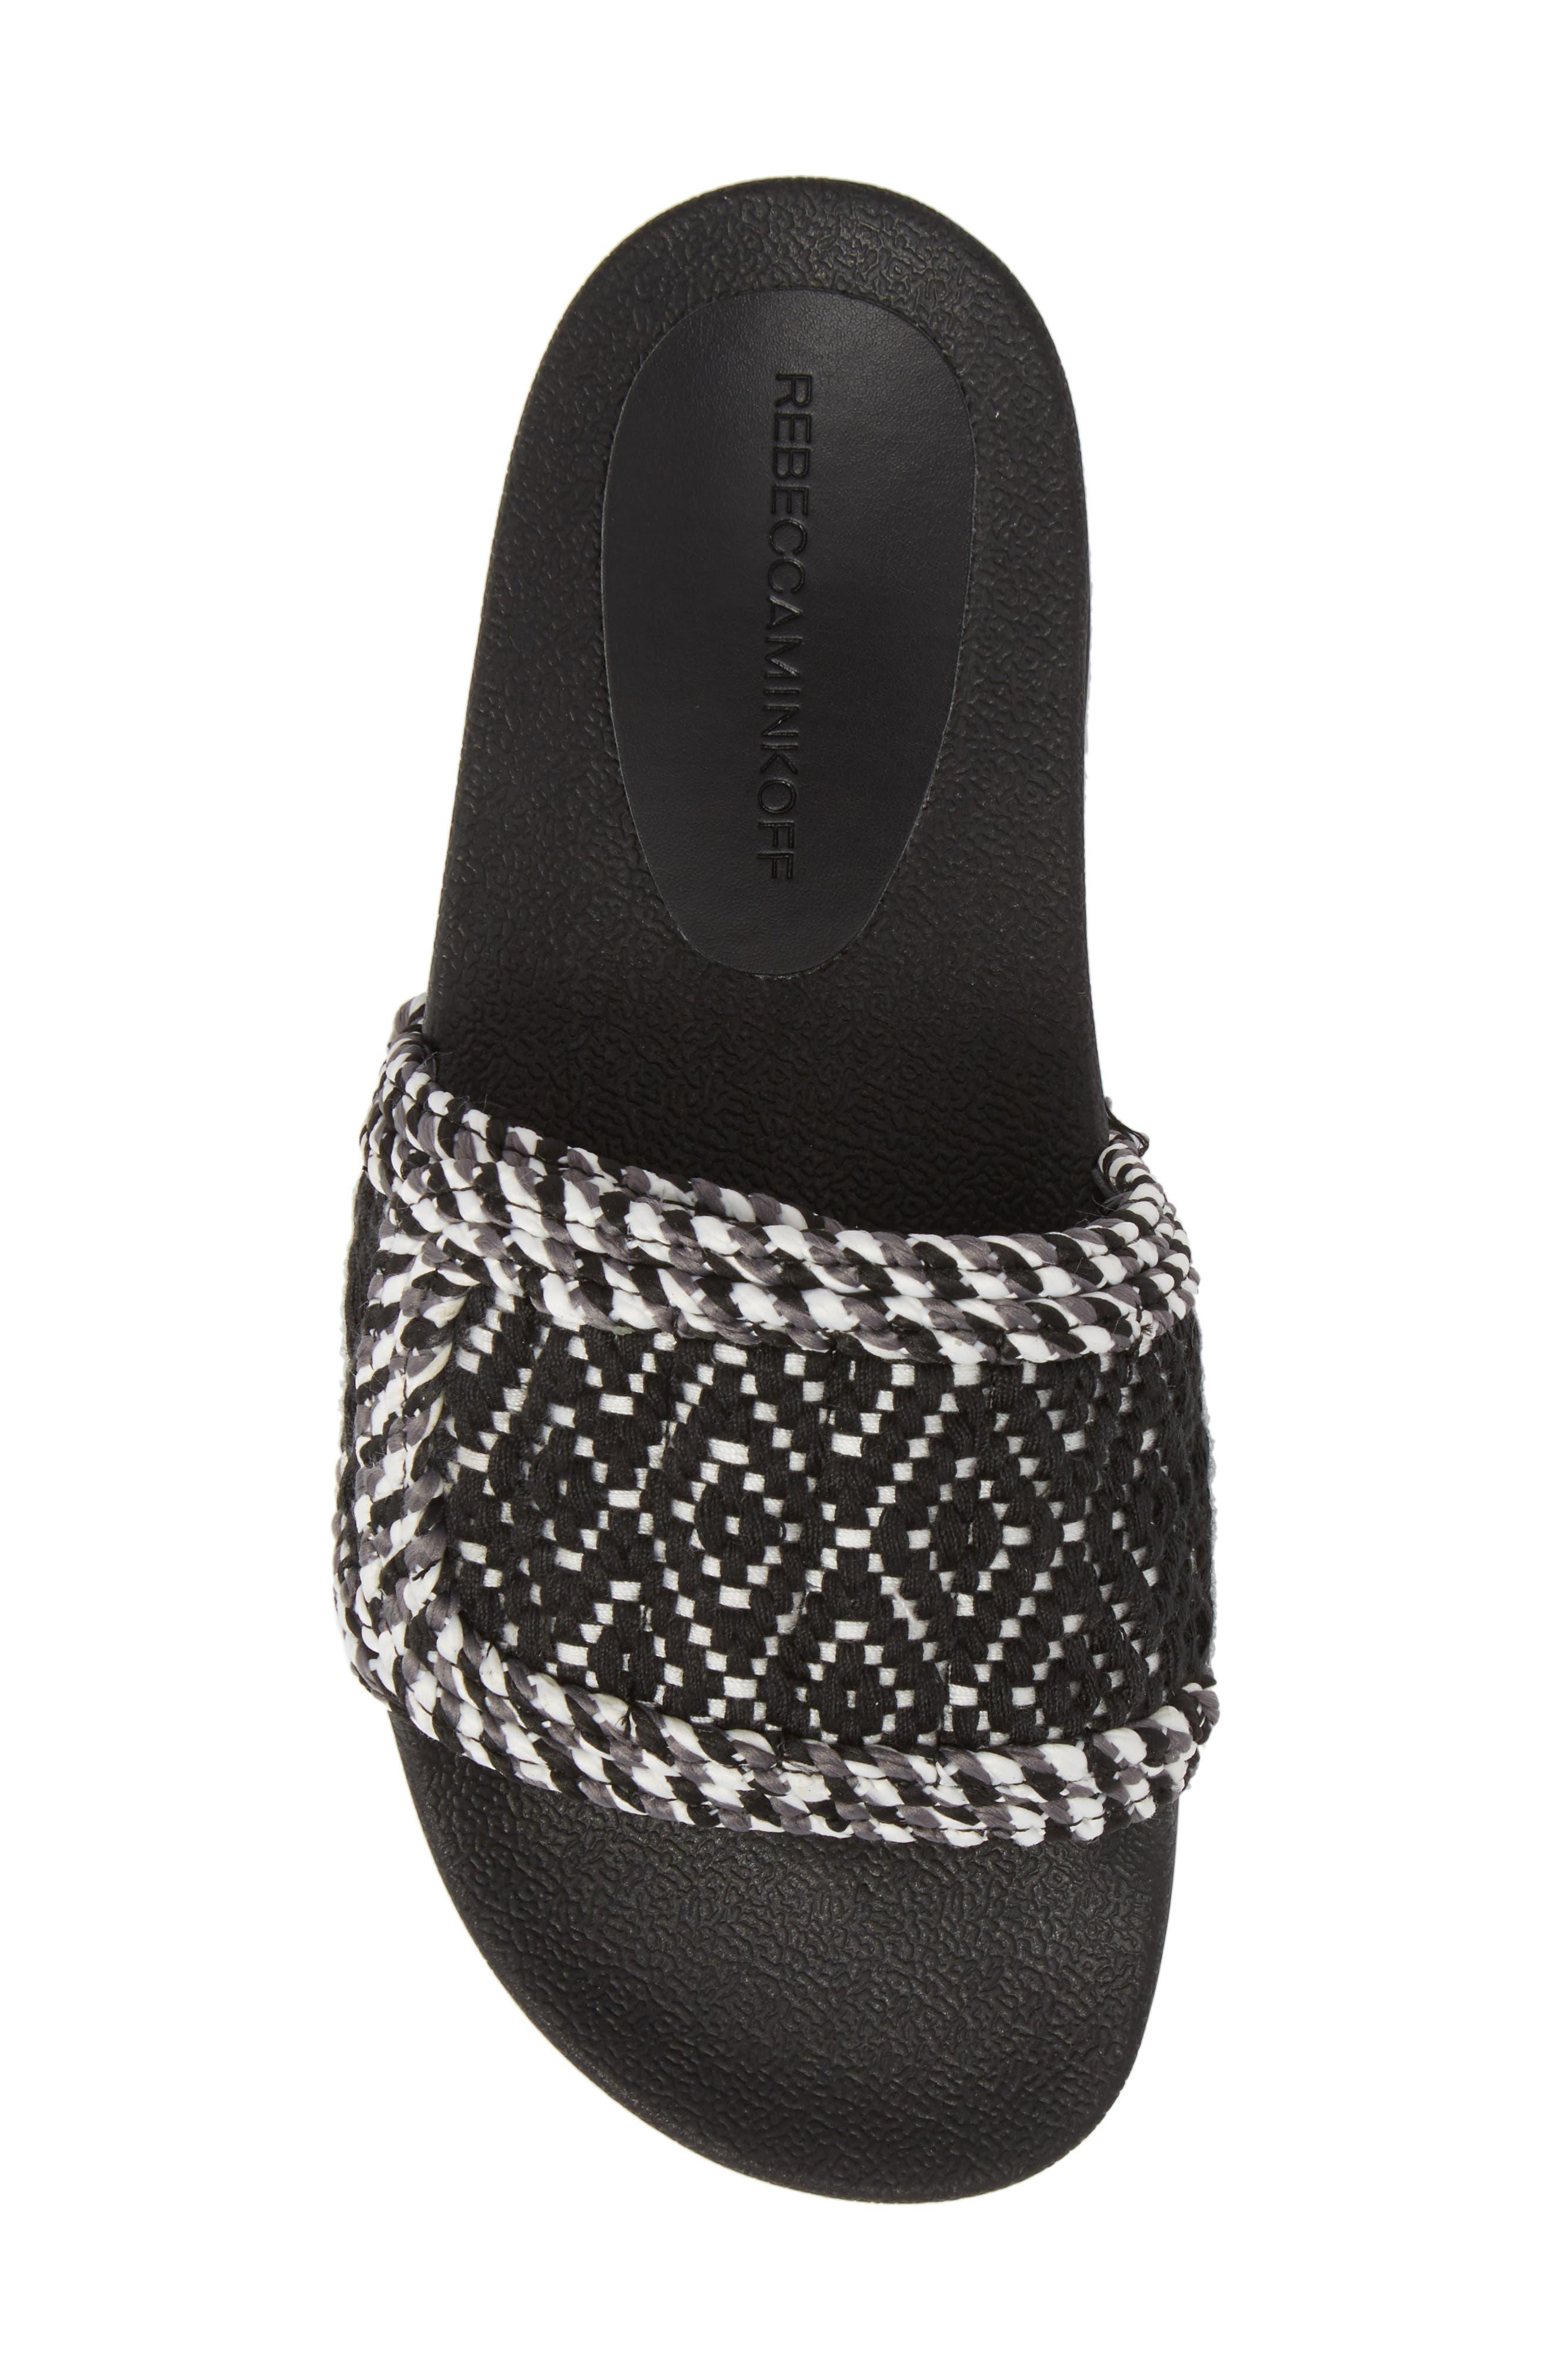 Tressa Woven Slide Sandal,                             Alternate thumbnail 5, color,                             Black/ White Woven Fabric